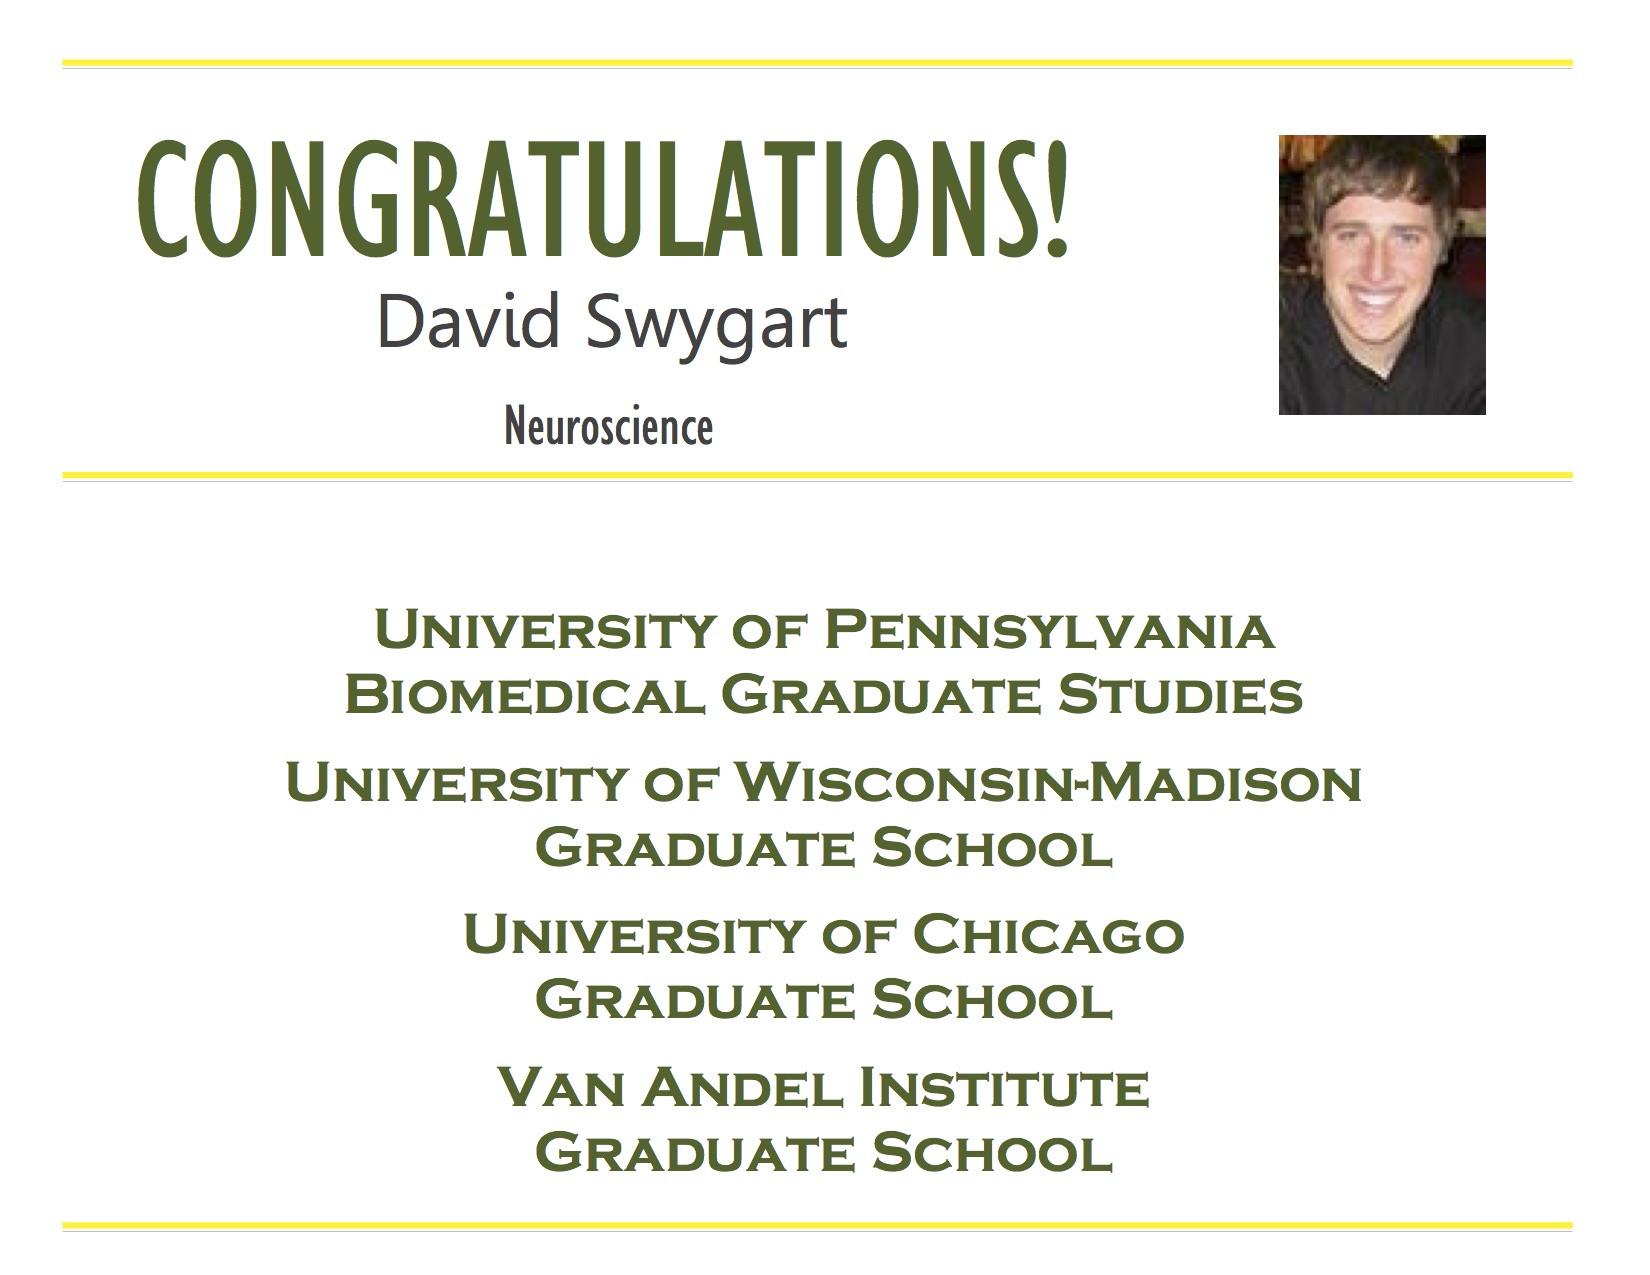 David Swygart (4).jpg